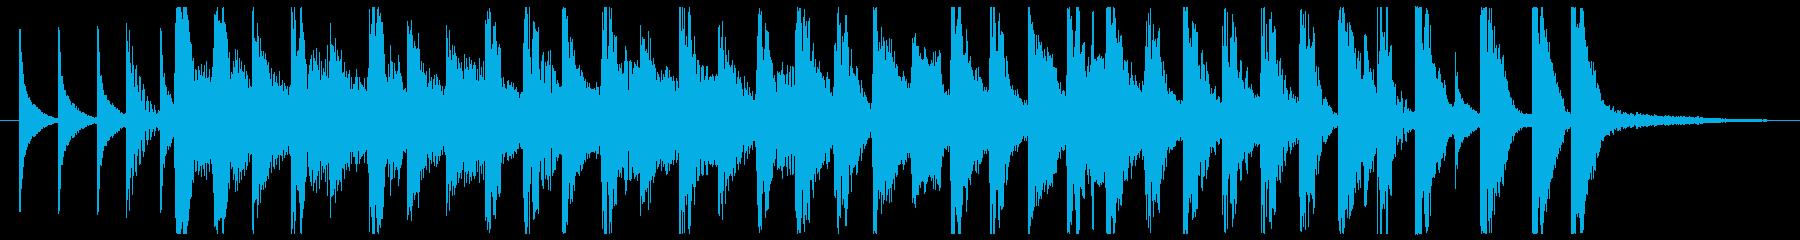 ElectroPop1・カワイイ・ポップの再生済みの波形